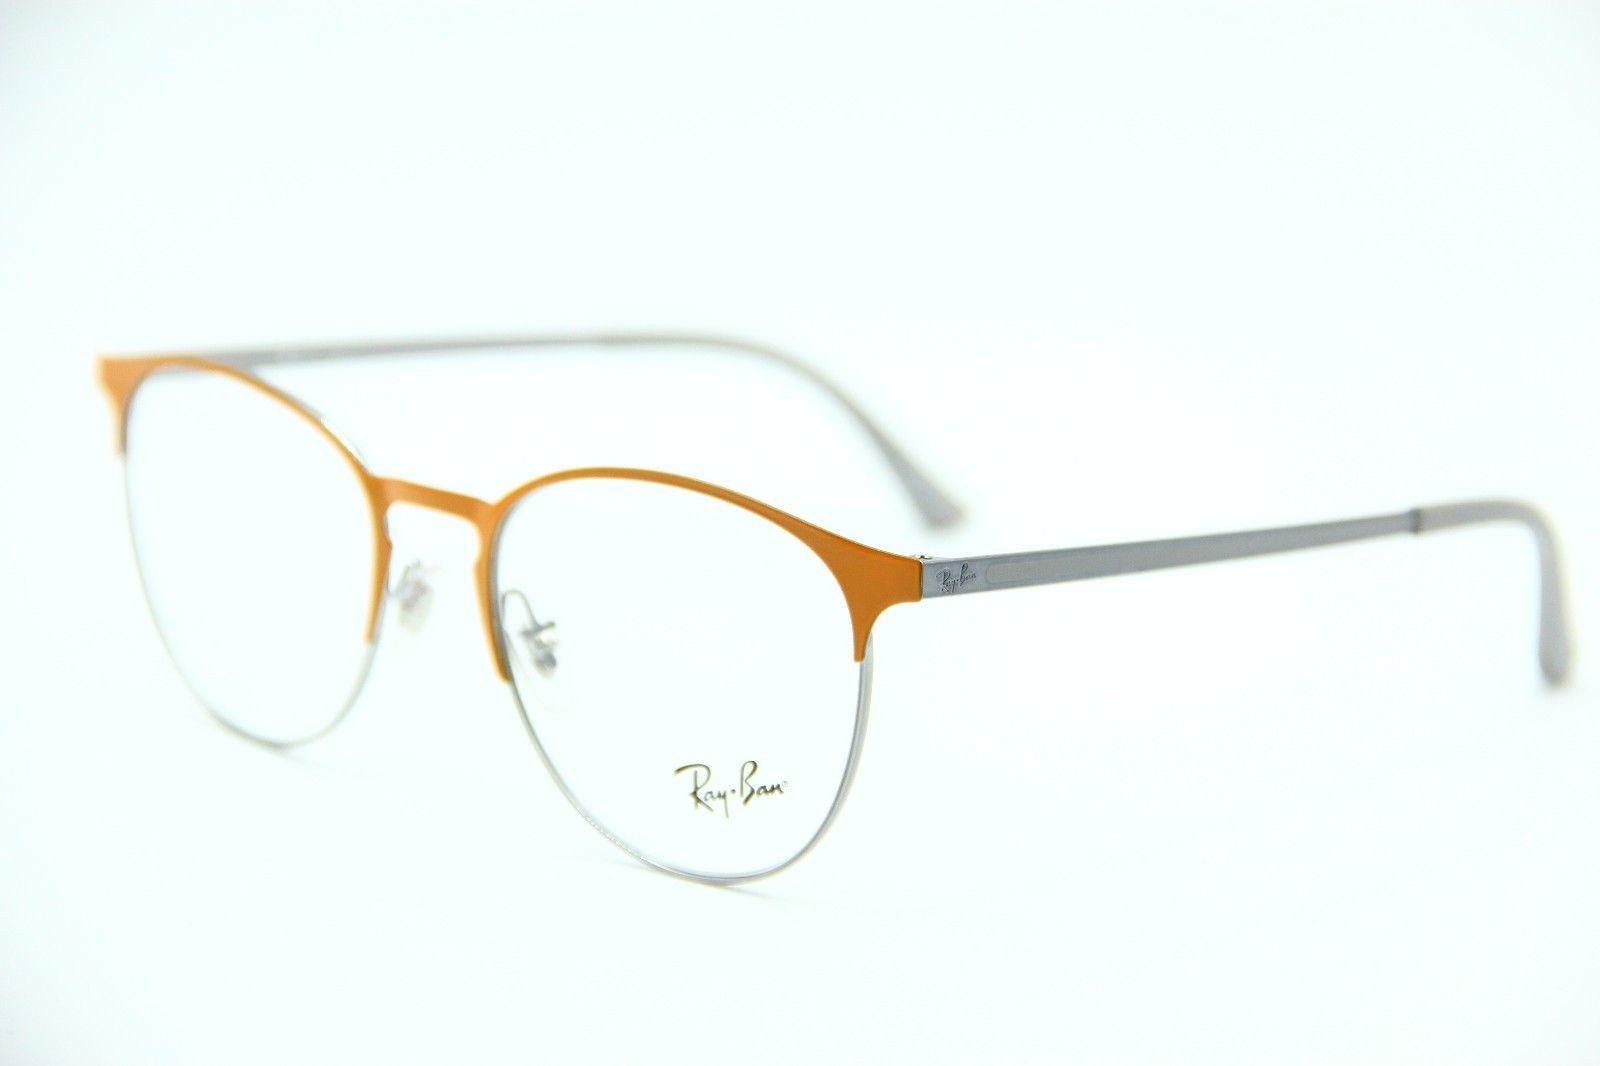 cc711a5fac2 New RAY-BAN Rb 6375 2949 Orange Eyeglasses and 50 similar items. 57